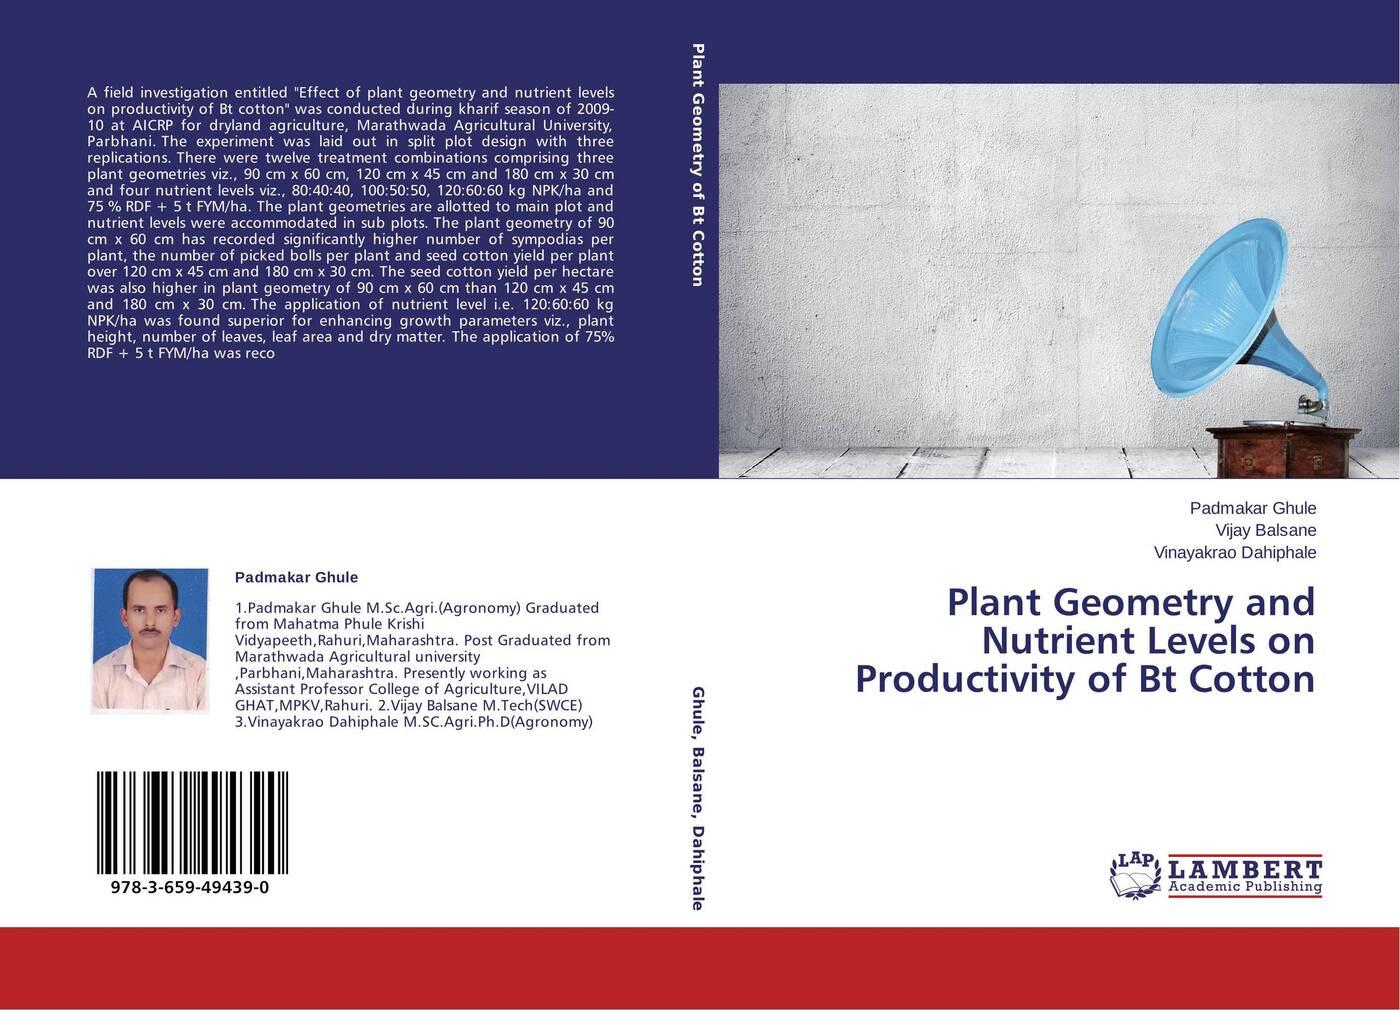 Padmakar Ghule,Vijay Balsane and Vinayakrao Dahiphale Plant Geometry and Nutrient Levels on Productivity of Bt Cotton table cloth round ethel rose flower 220 cm x x 220 cm 100